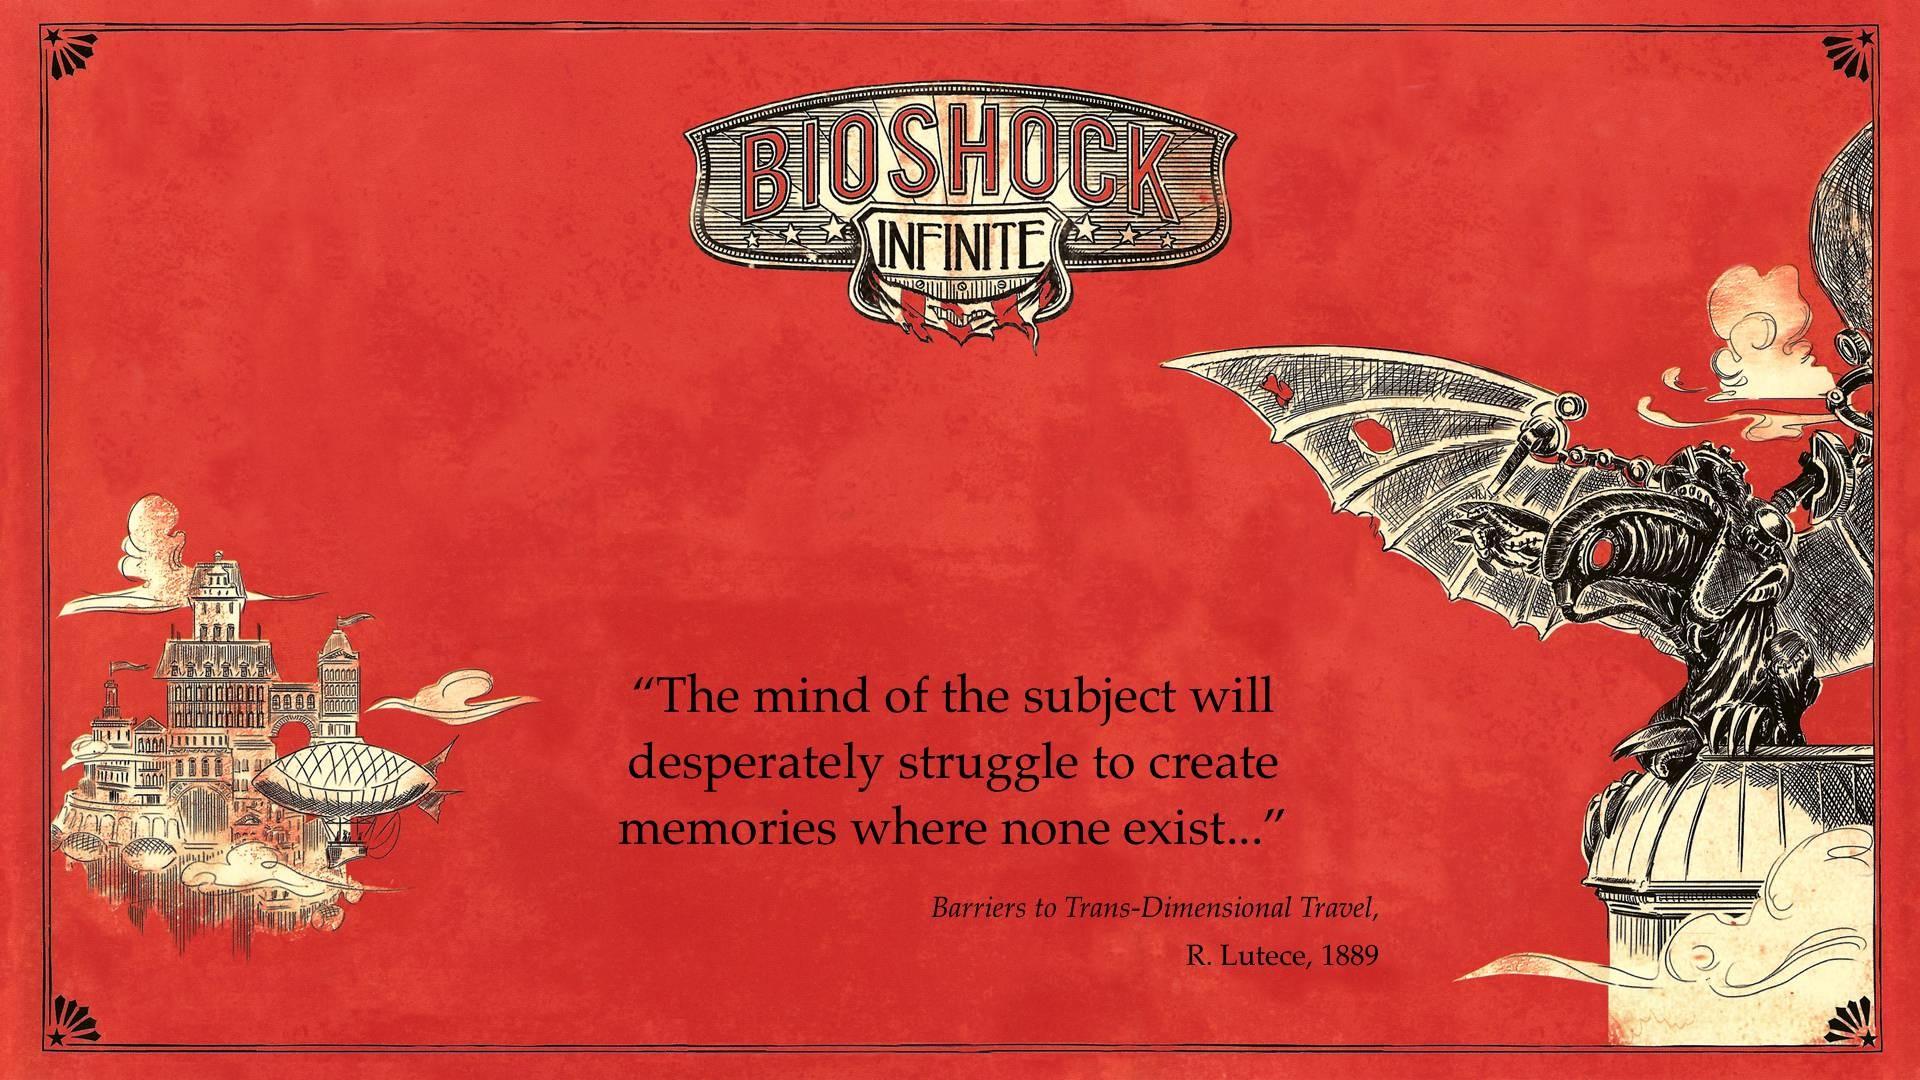 BioShock Infinite HD Wallpaper 1920×1080